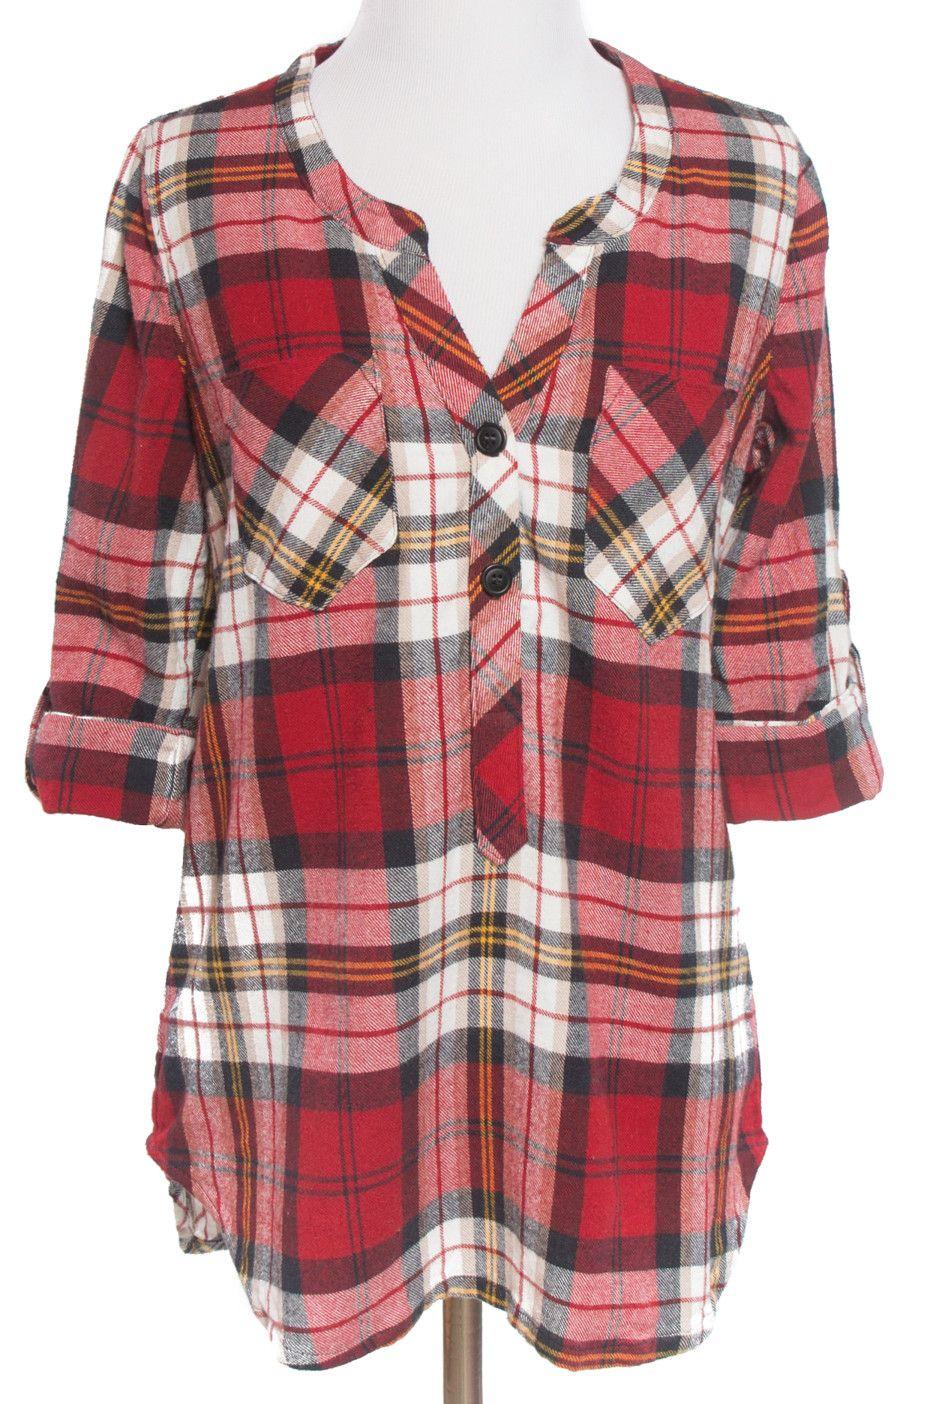 Cheyenne Tunic Sewing Pattern by Hey June | Nähen und Schnittmuster